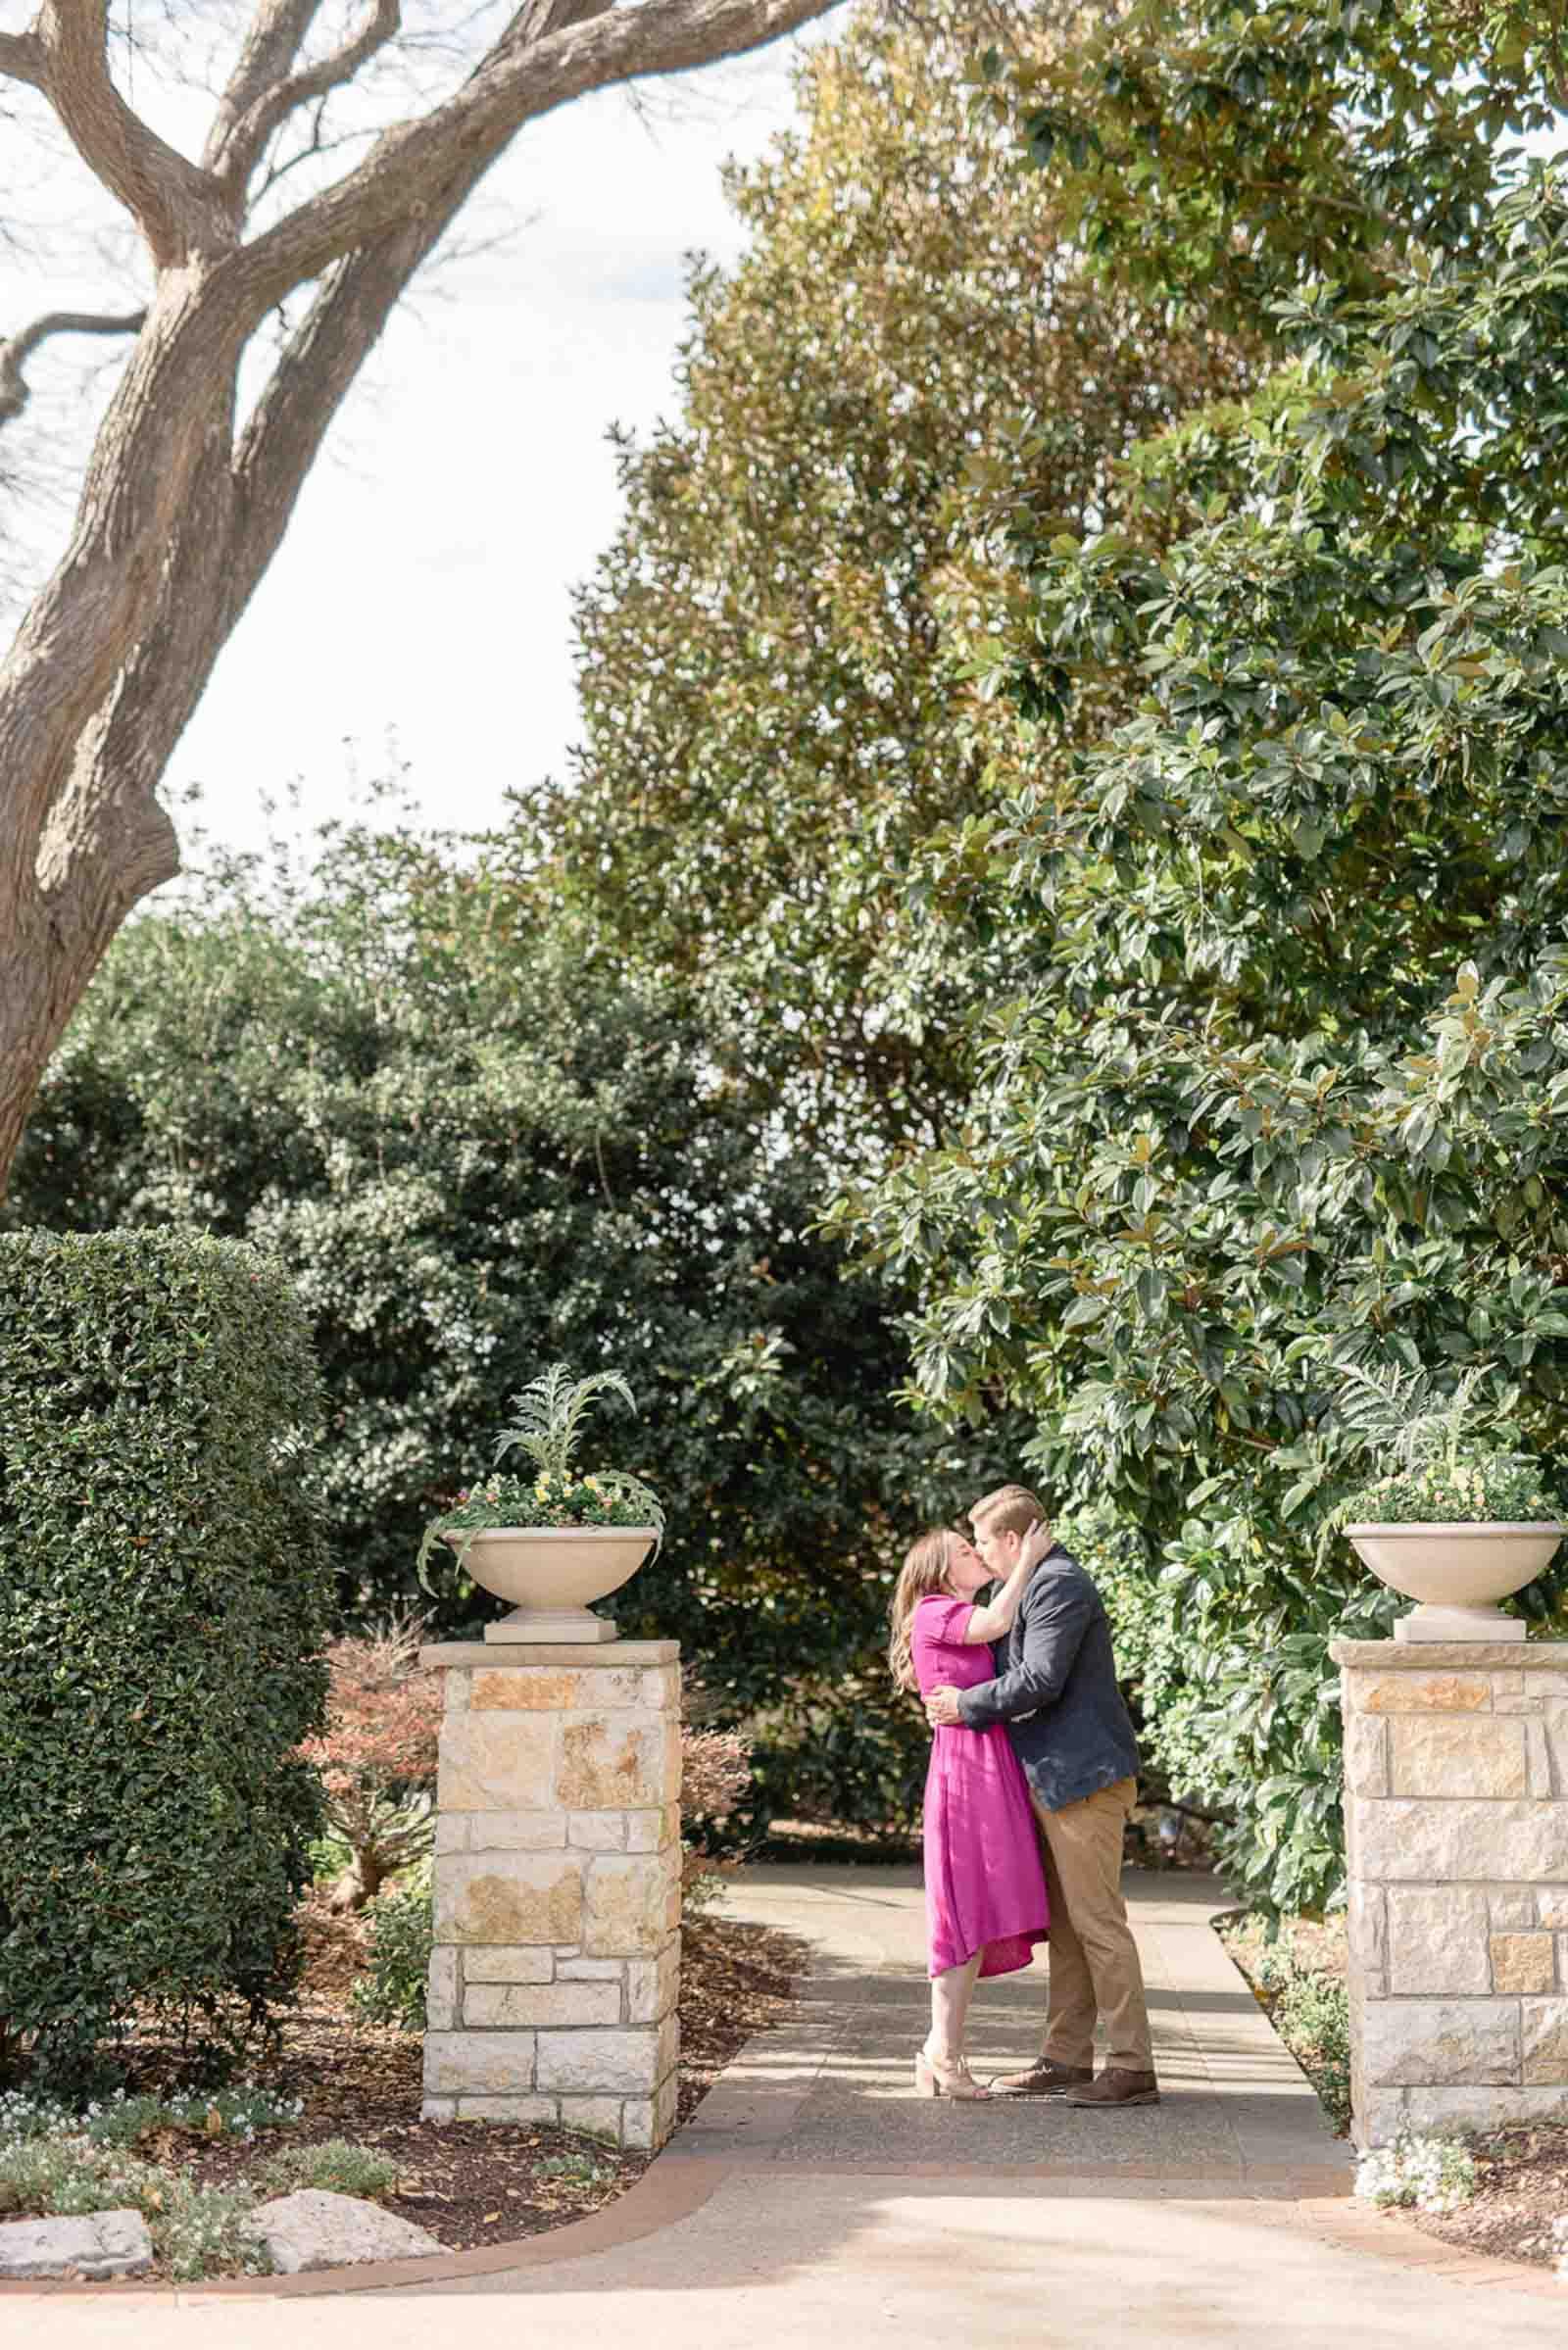 Dallas Arboretum Engagement-JenSymes-14.jpg